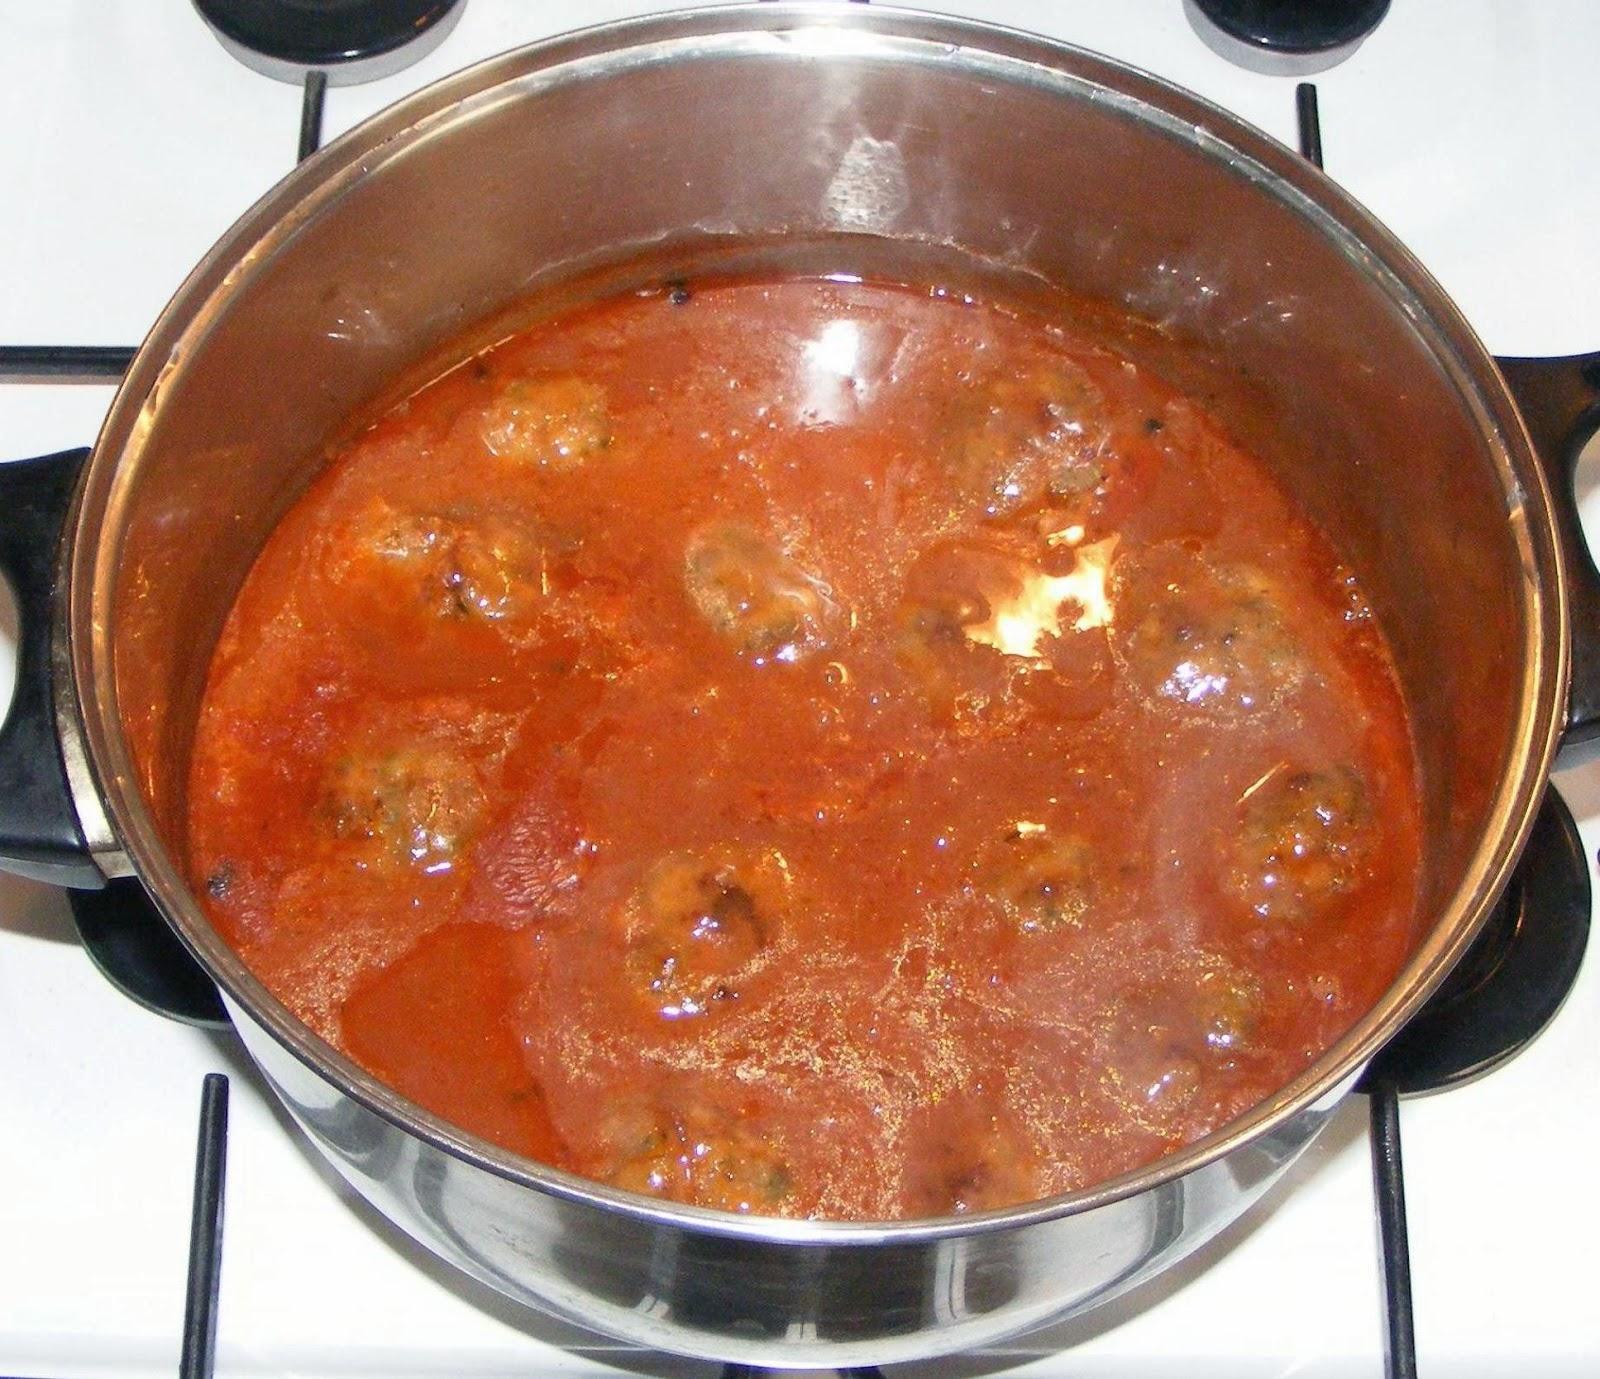 chiftele marinate, sos chiftele, sos pentru chiftele, sos marinat, retete sos, reteta sos, sos retete, sos reteta, retete si preparate culinare, retete de mancare, mancaruri cu sos,